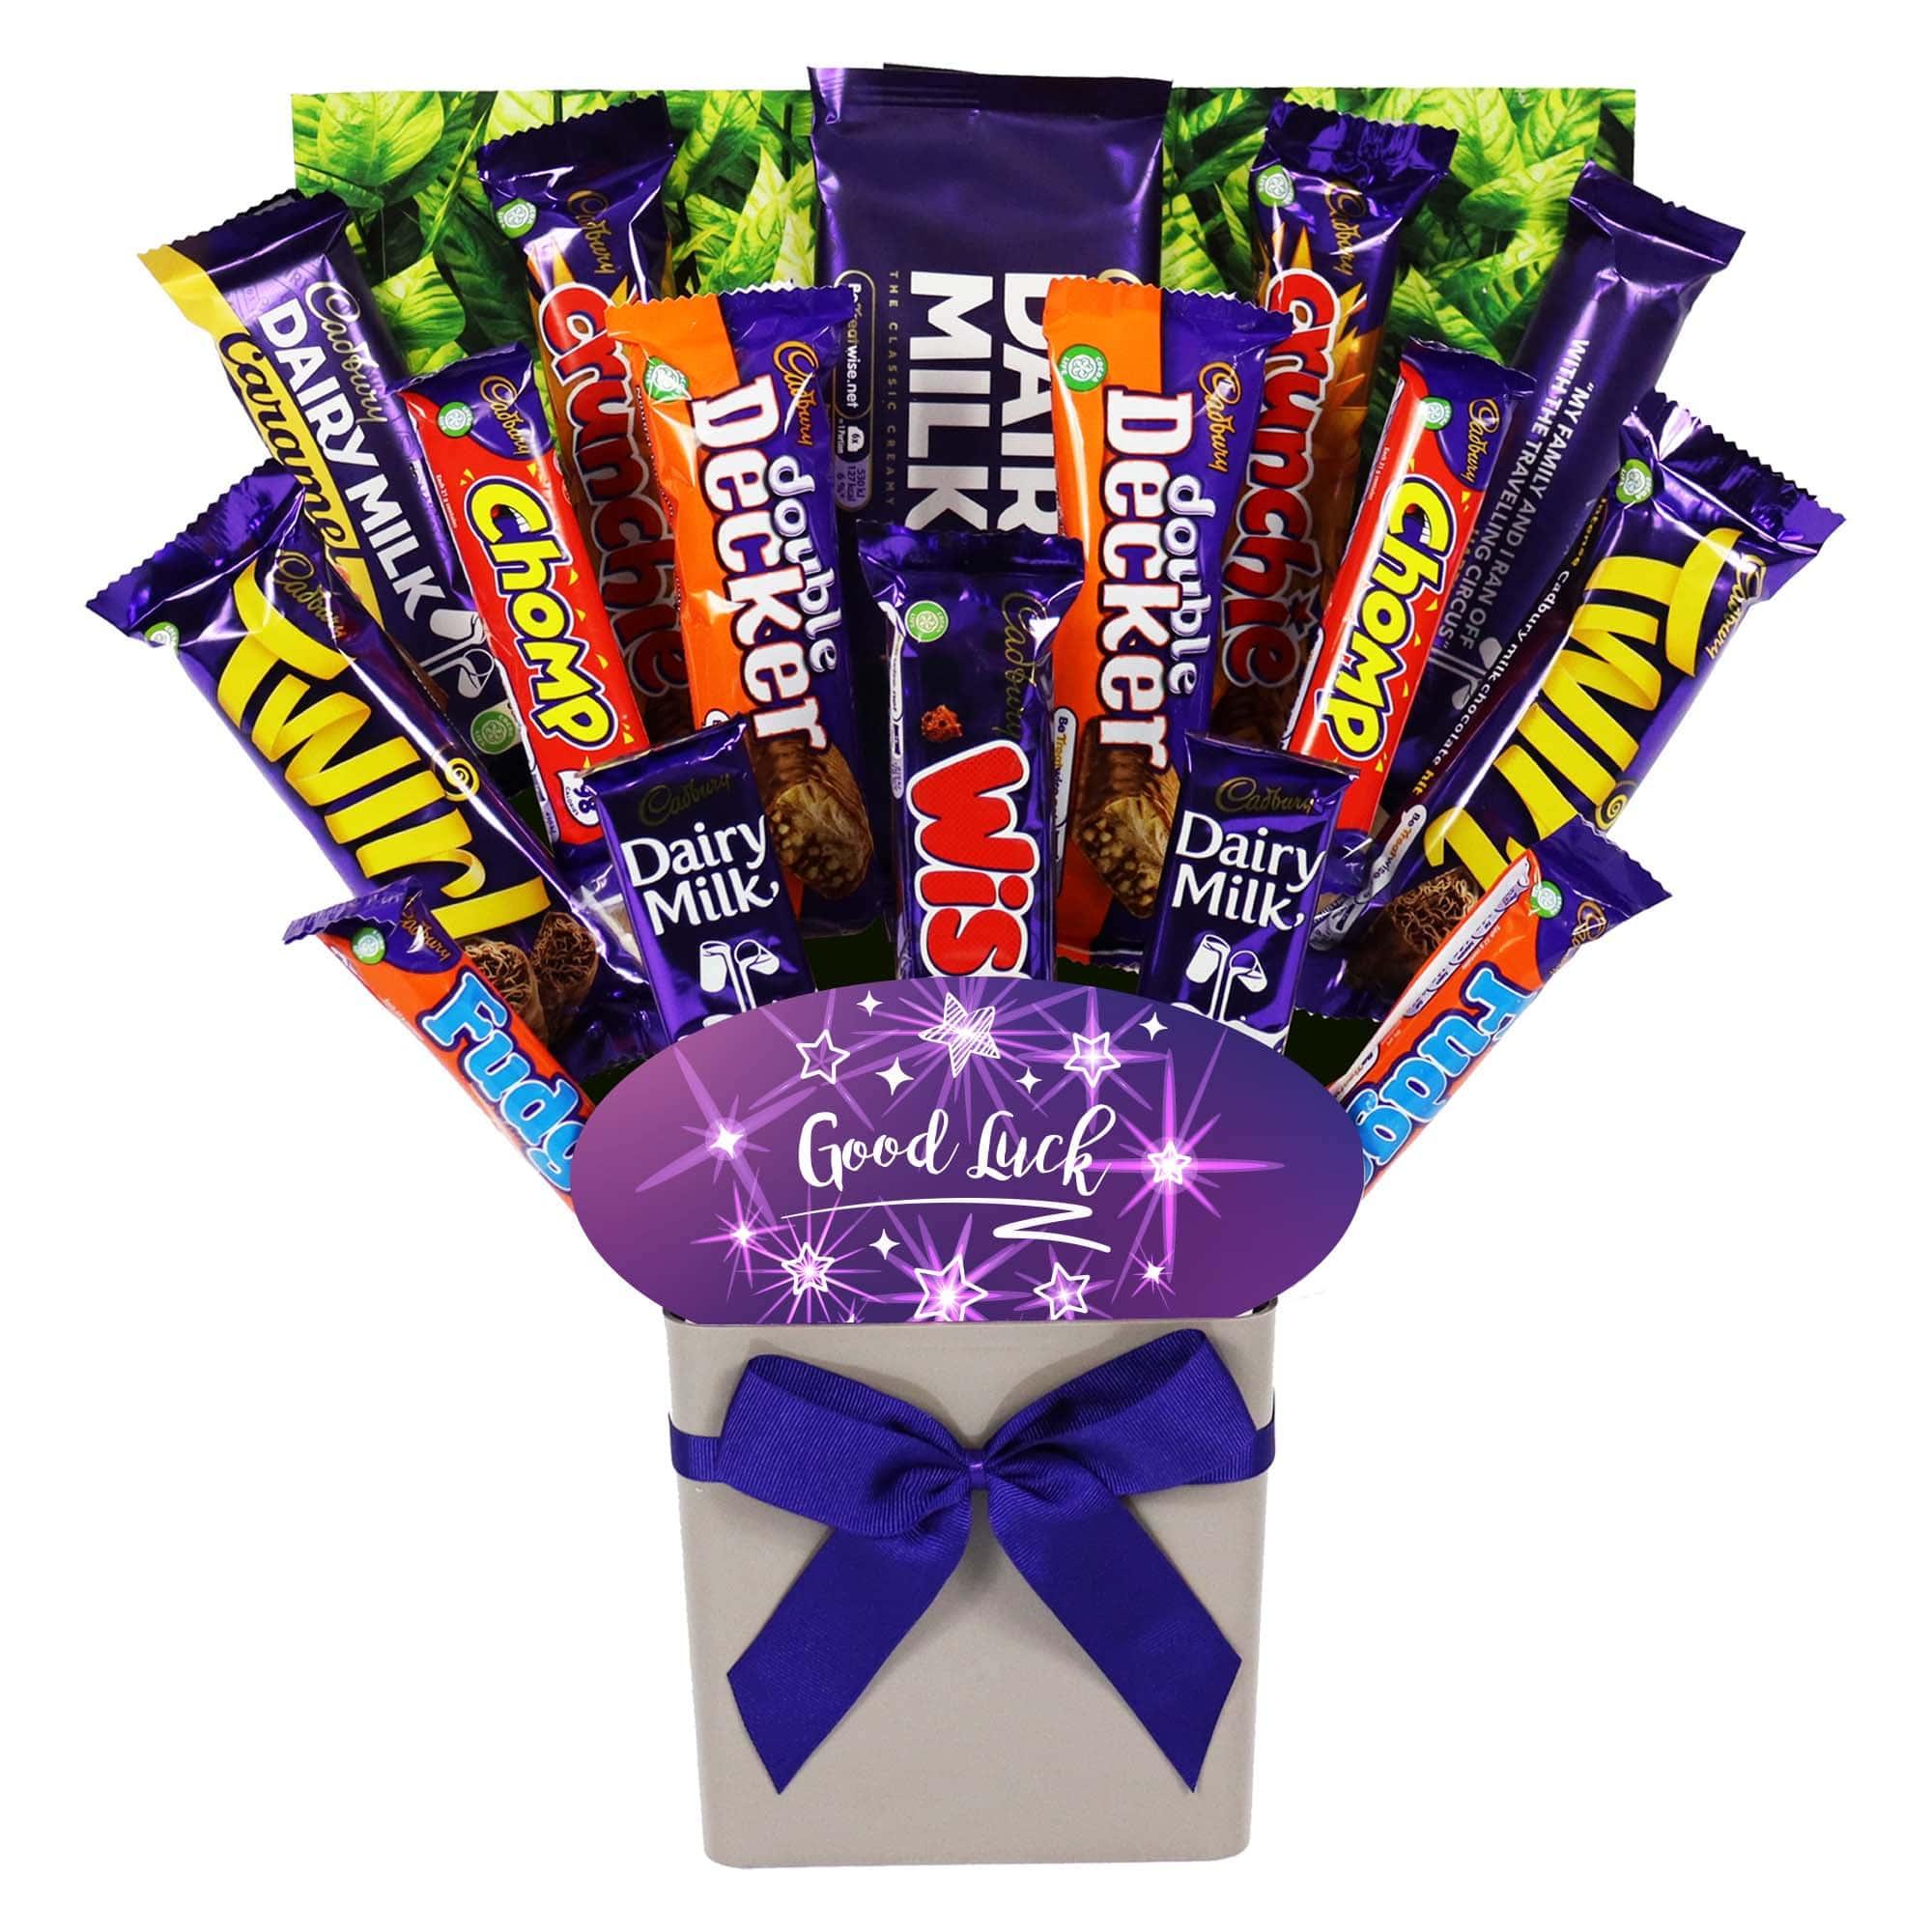 The Good Luck Cadbury Chocolate Bouquet